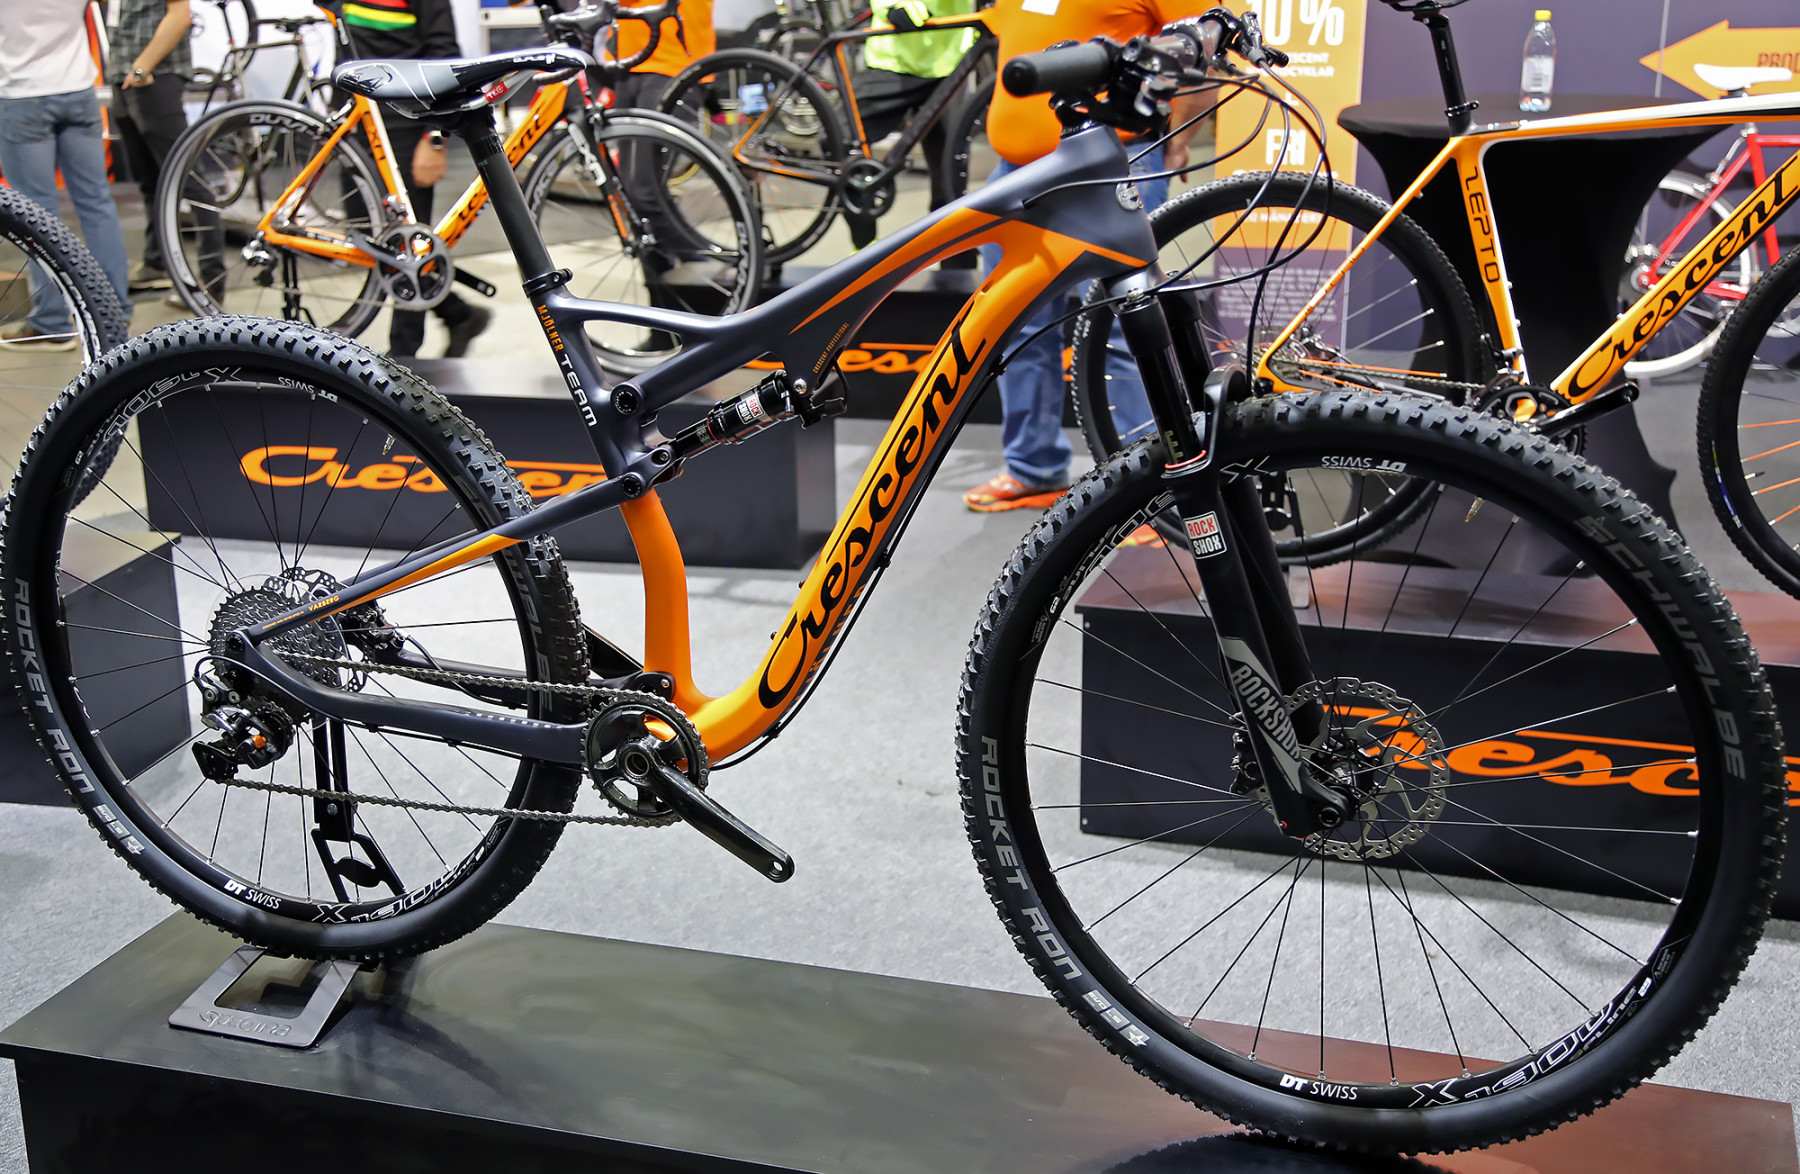 Sweden Bike Expo 2016 – Crescent – Happyride.se